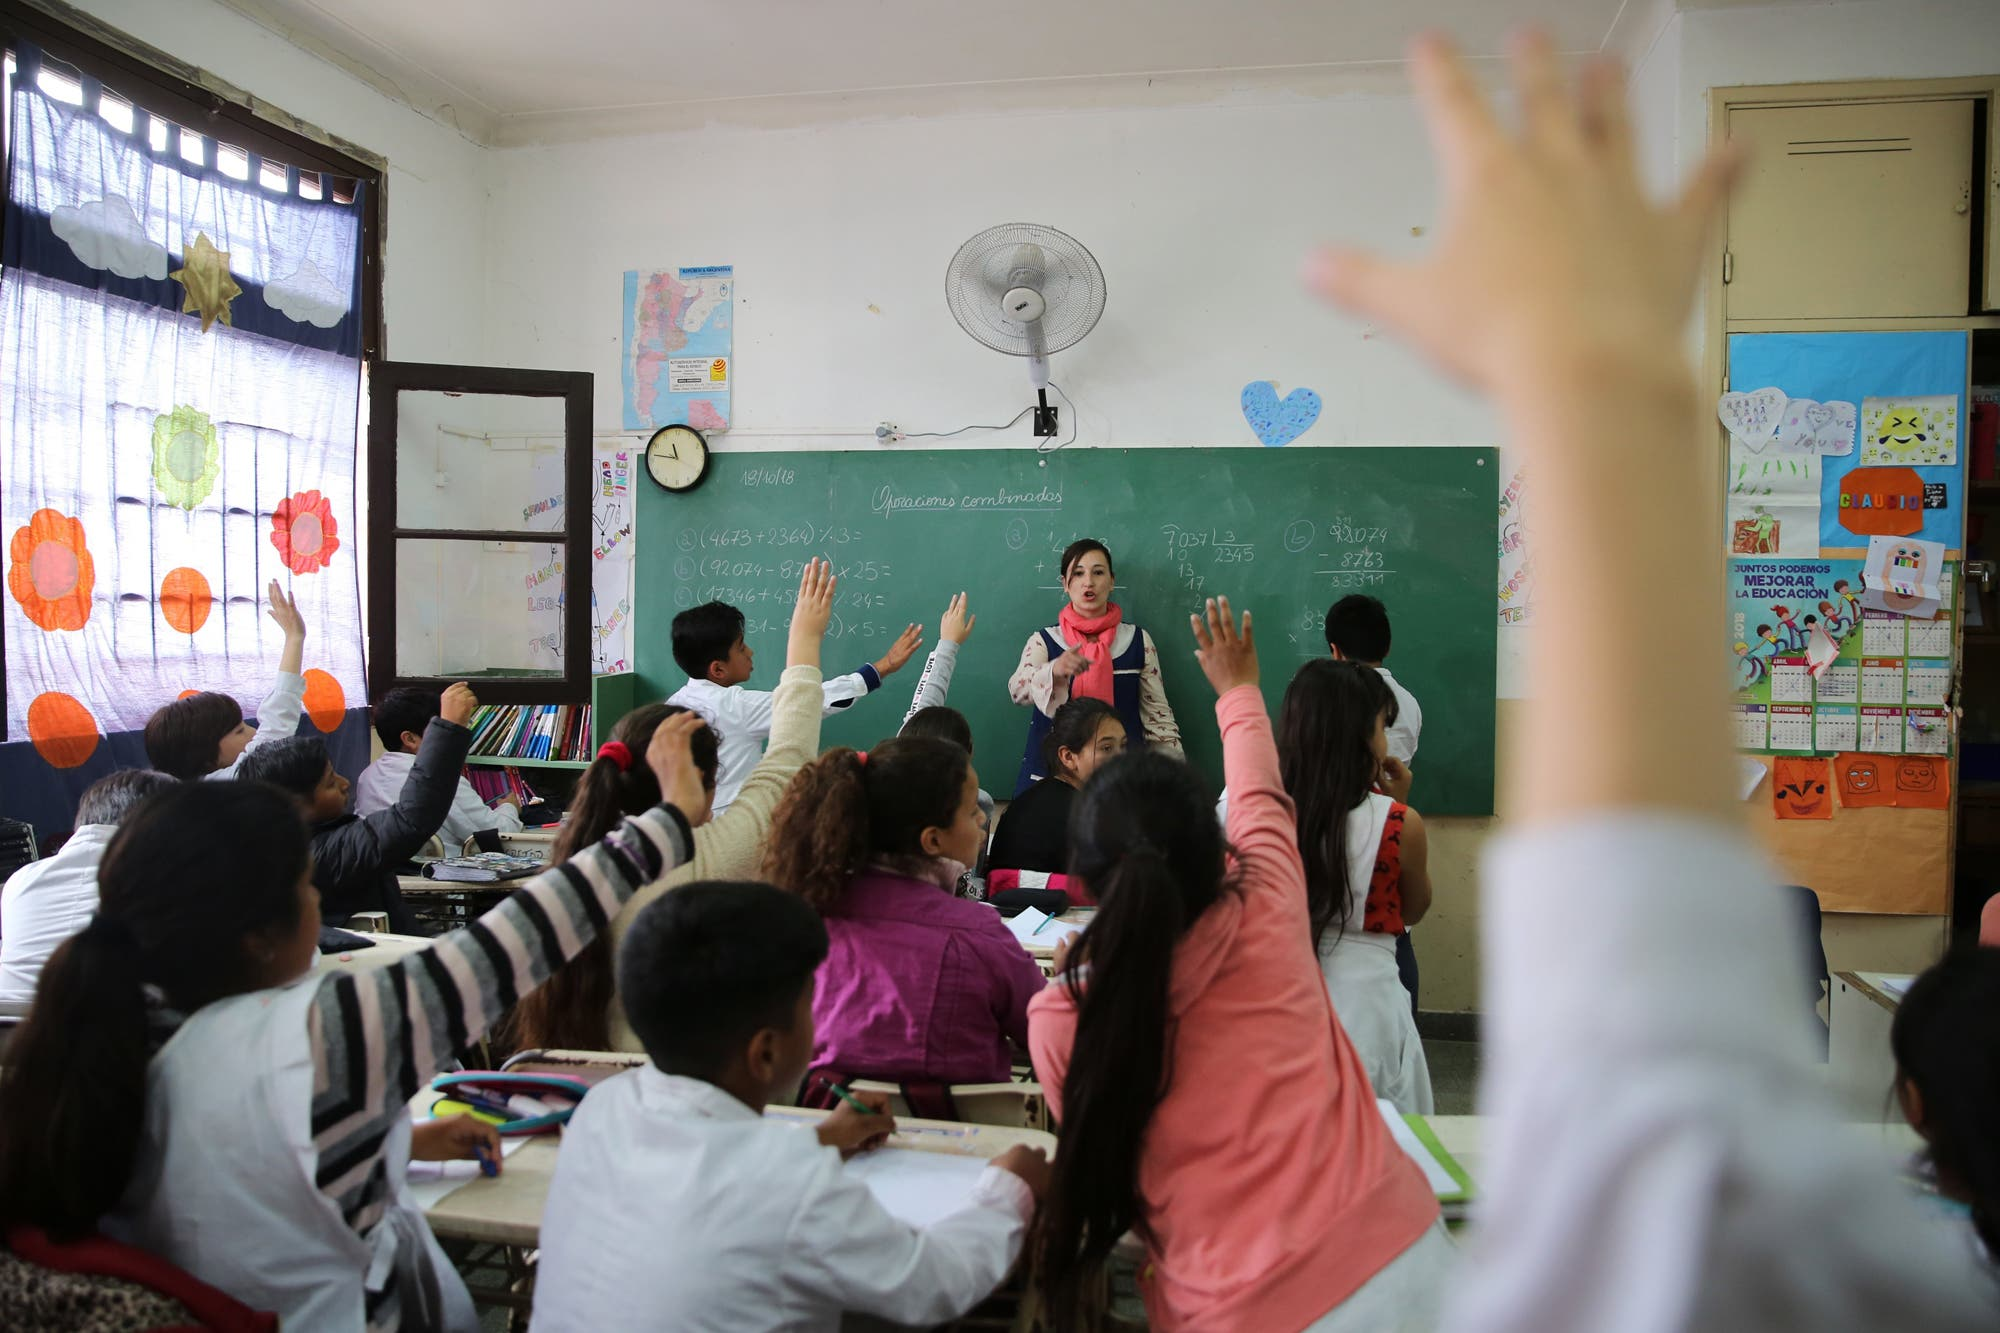 CrESI: la app creada por estudiantes secundarios para enseñar Educación Sexual Integral